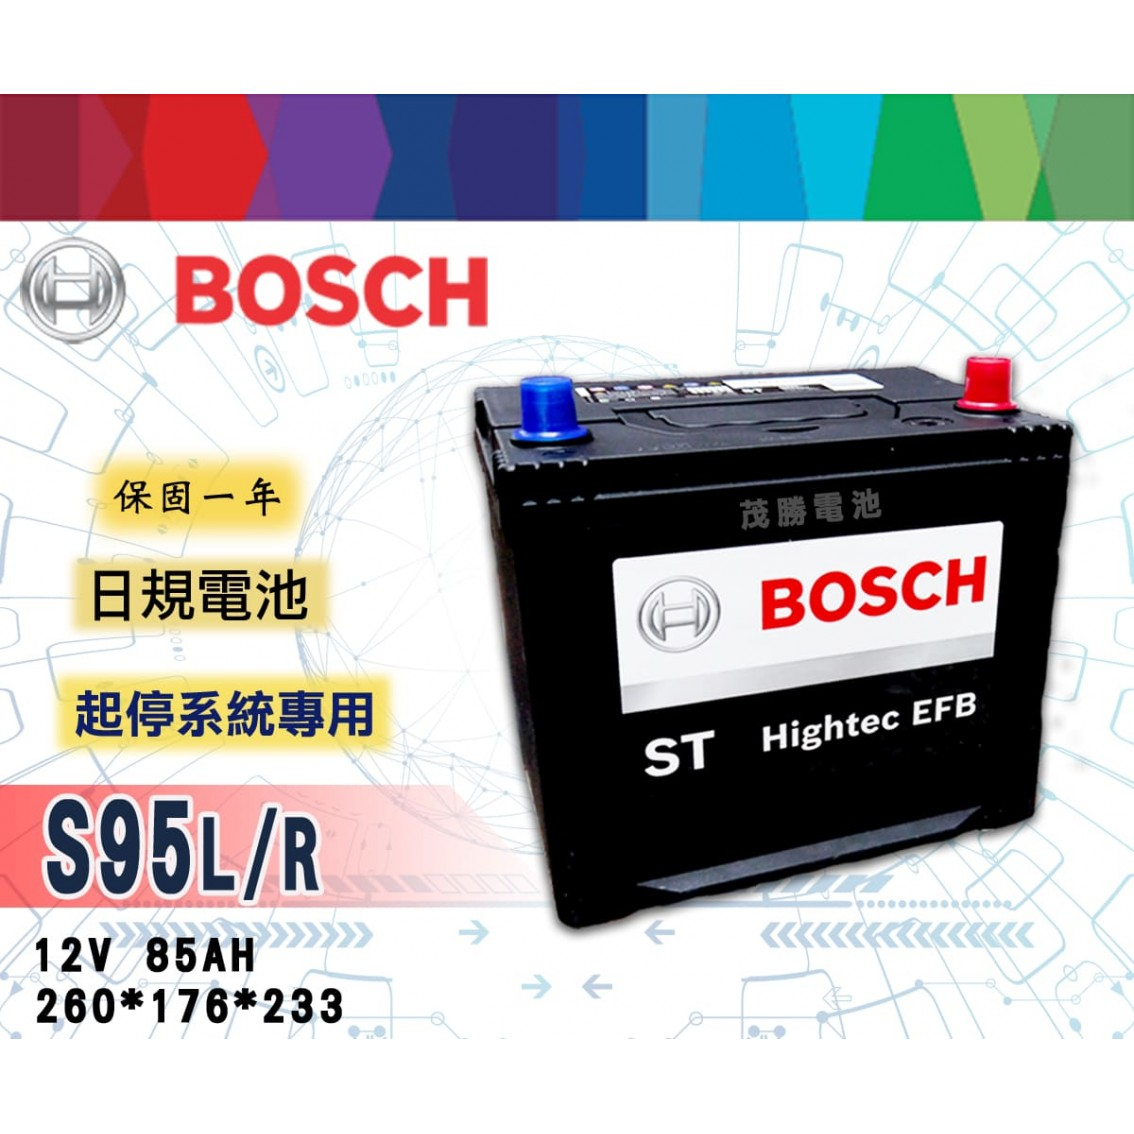 S95L/R-EFB